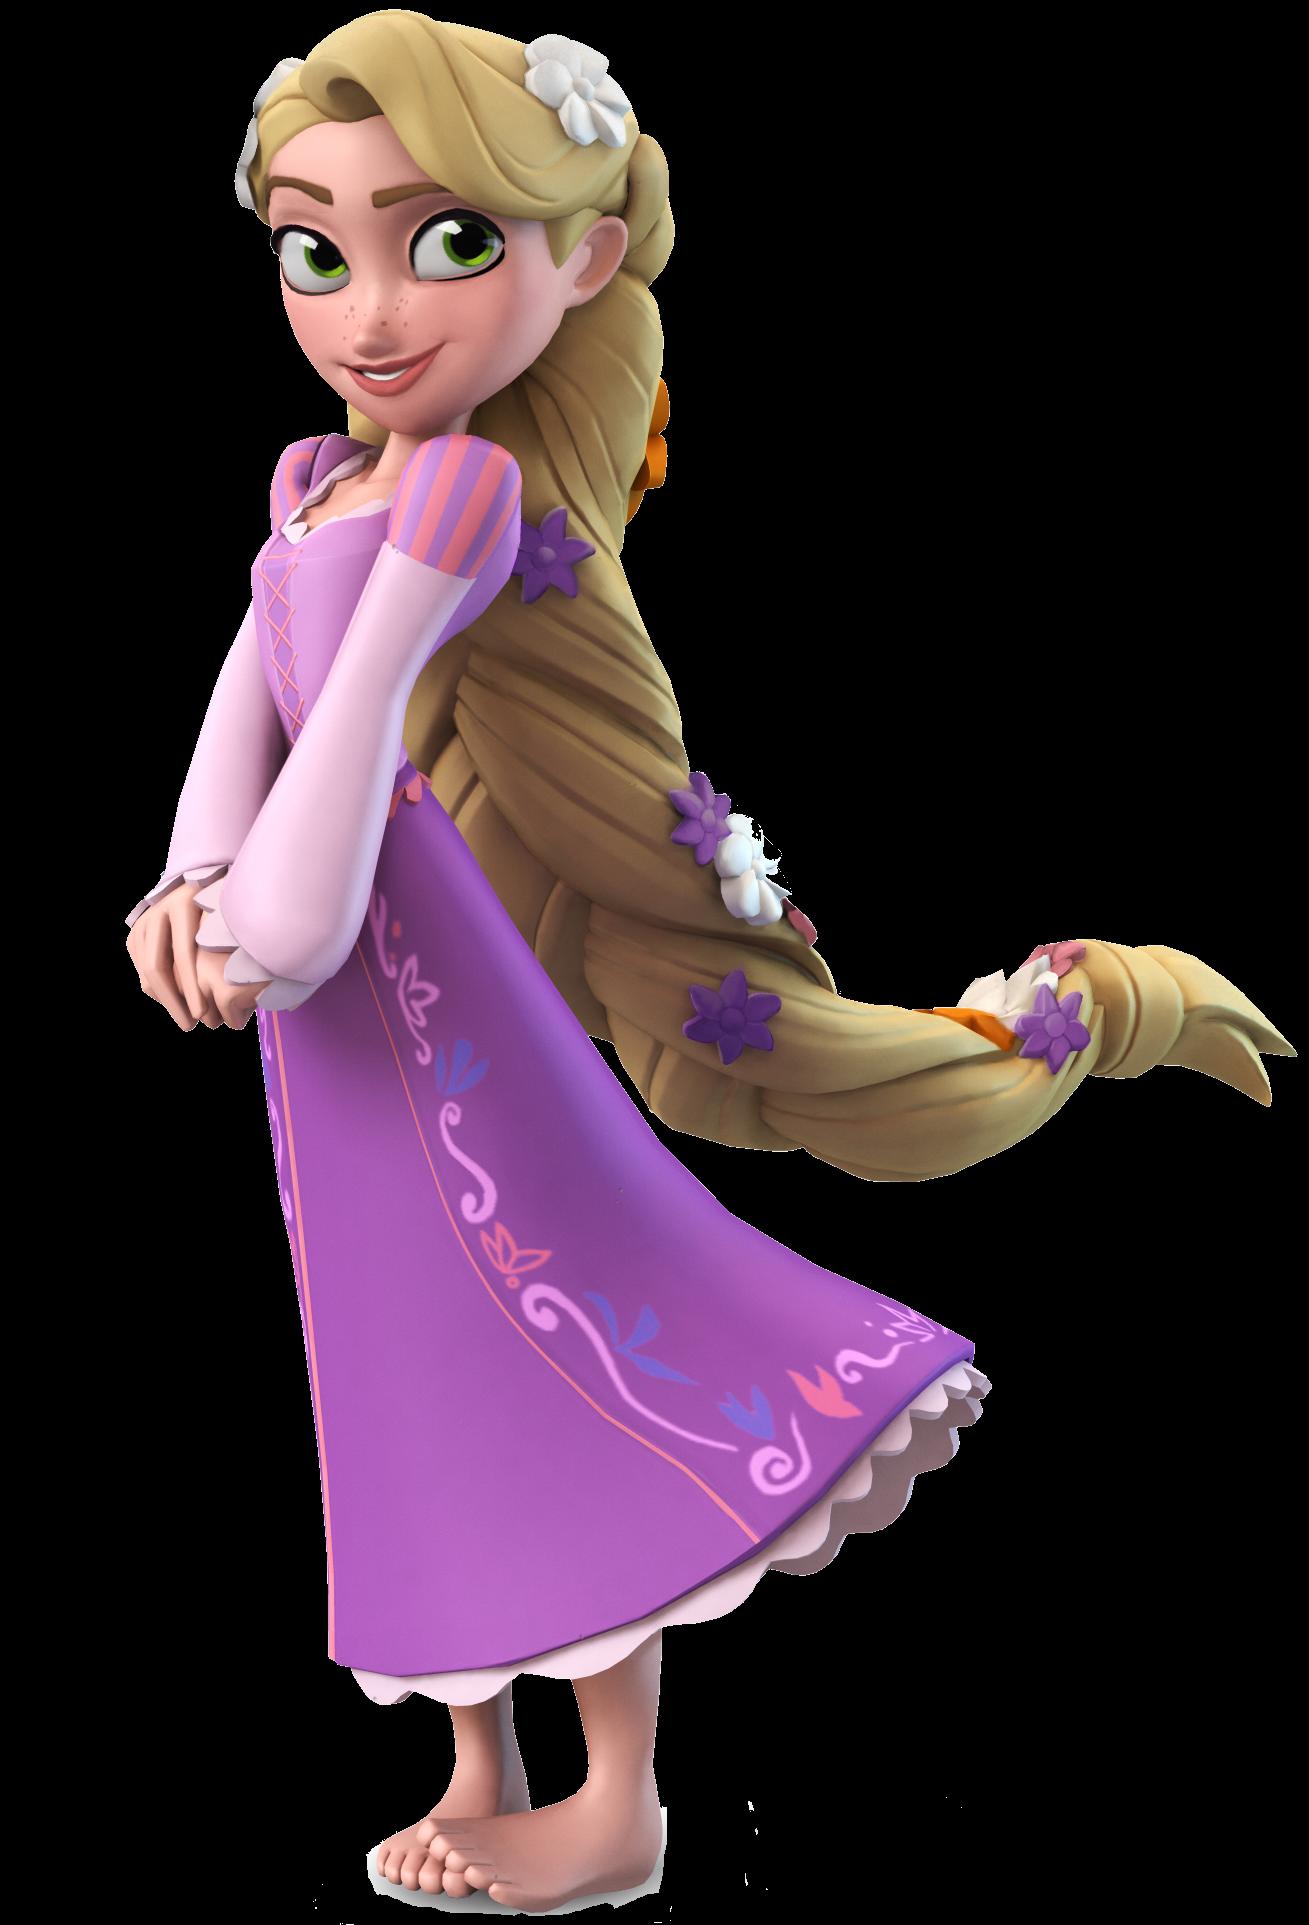 Rapunzel DI Render  Rapunzel DI Ren...